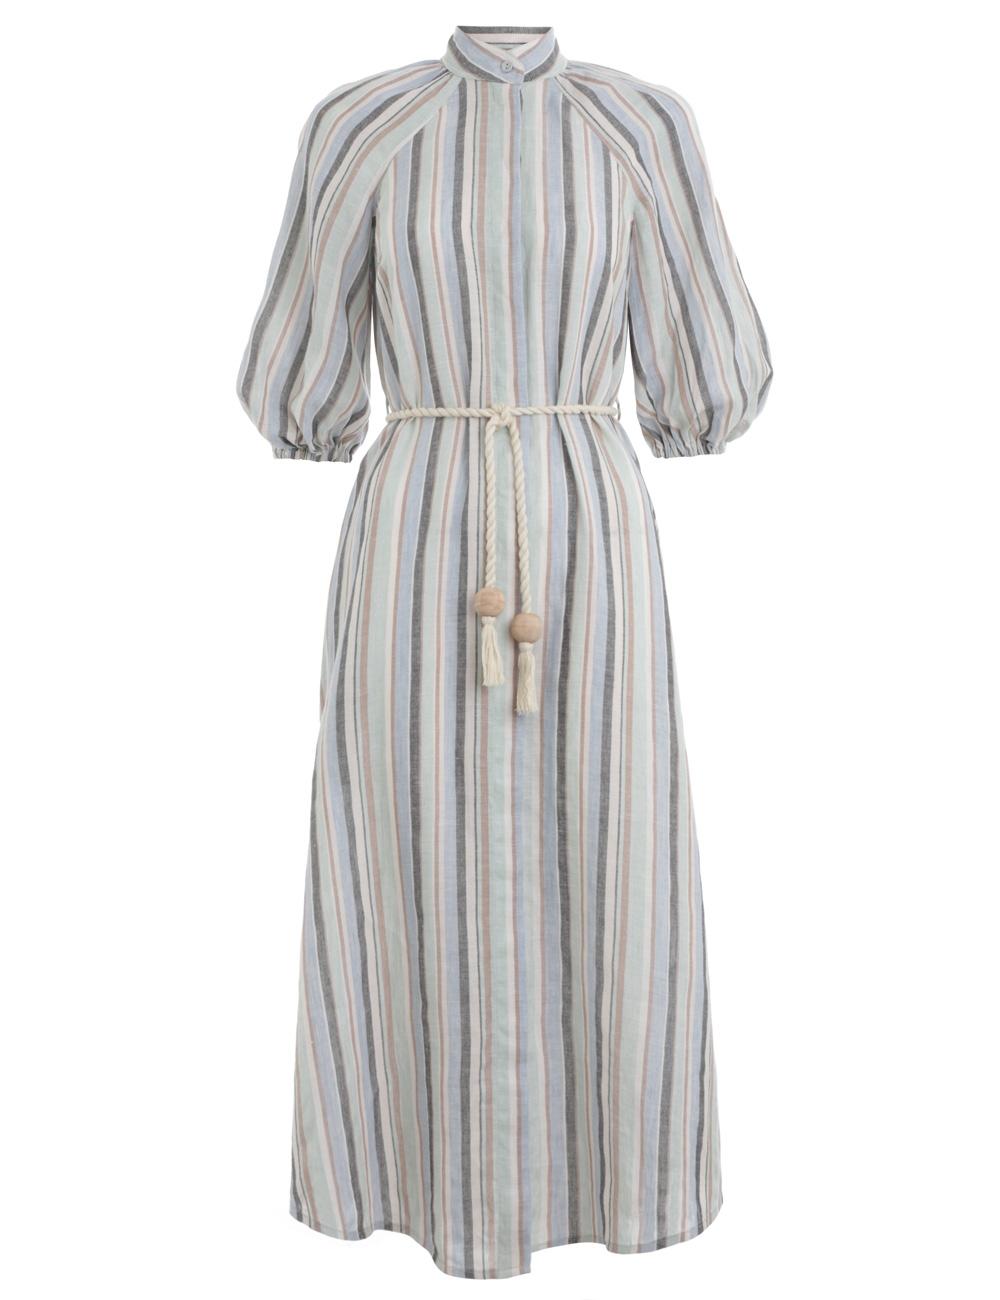 Wayfarer Picnic Shirt Dress